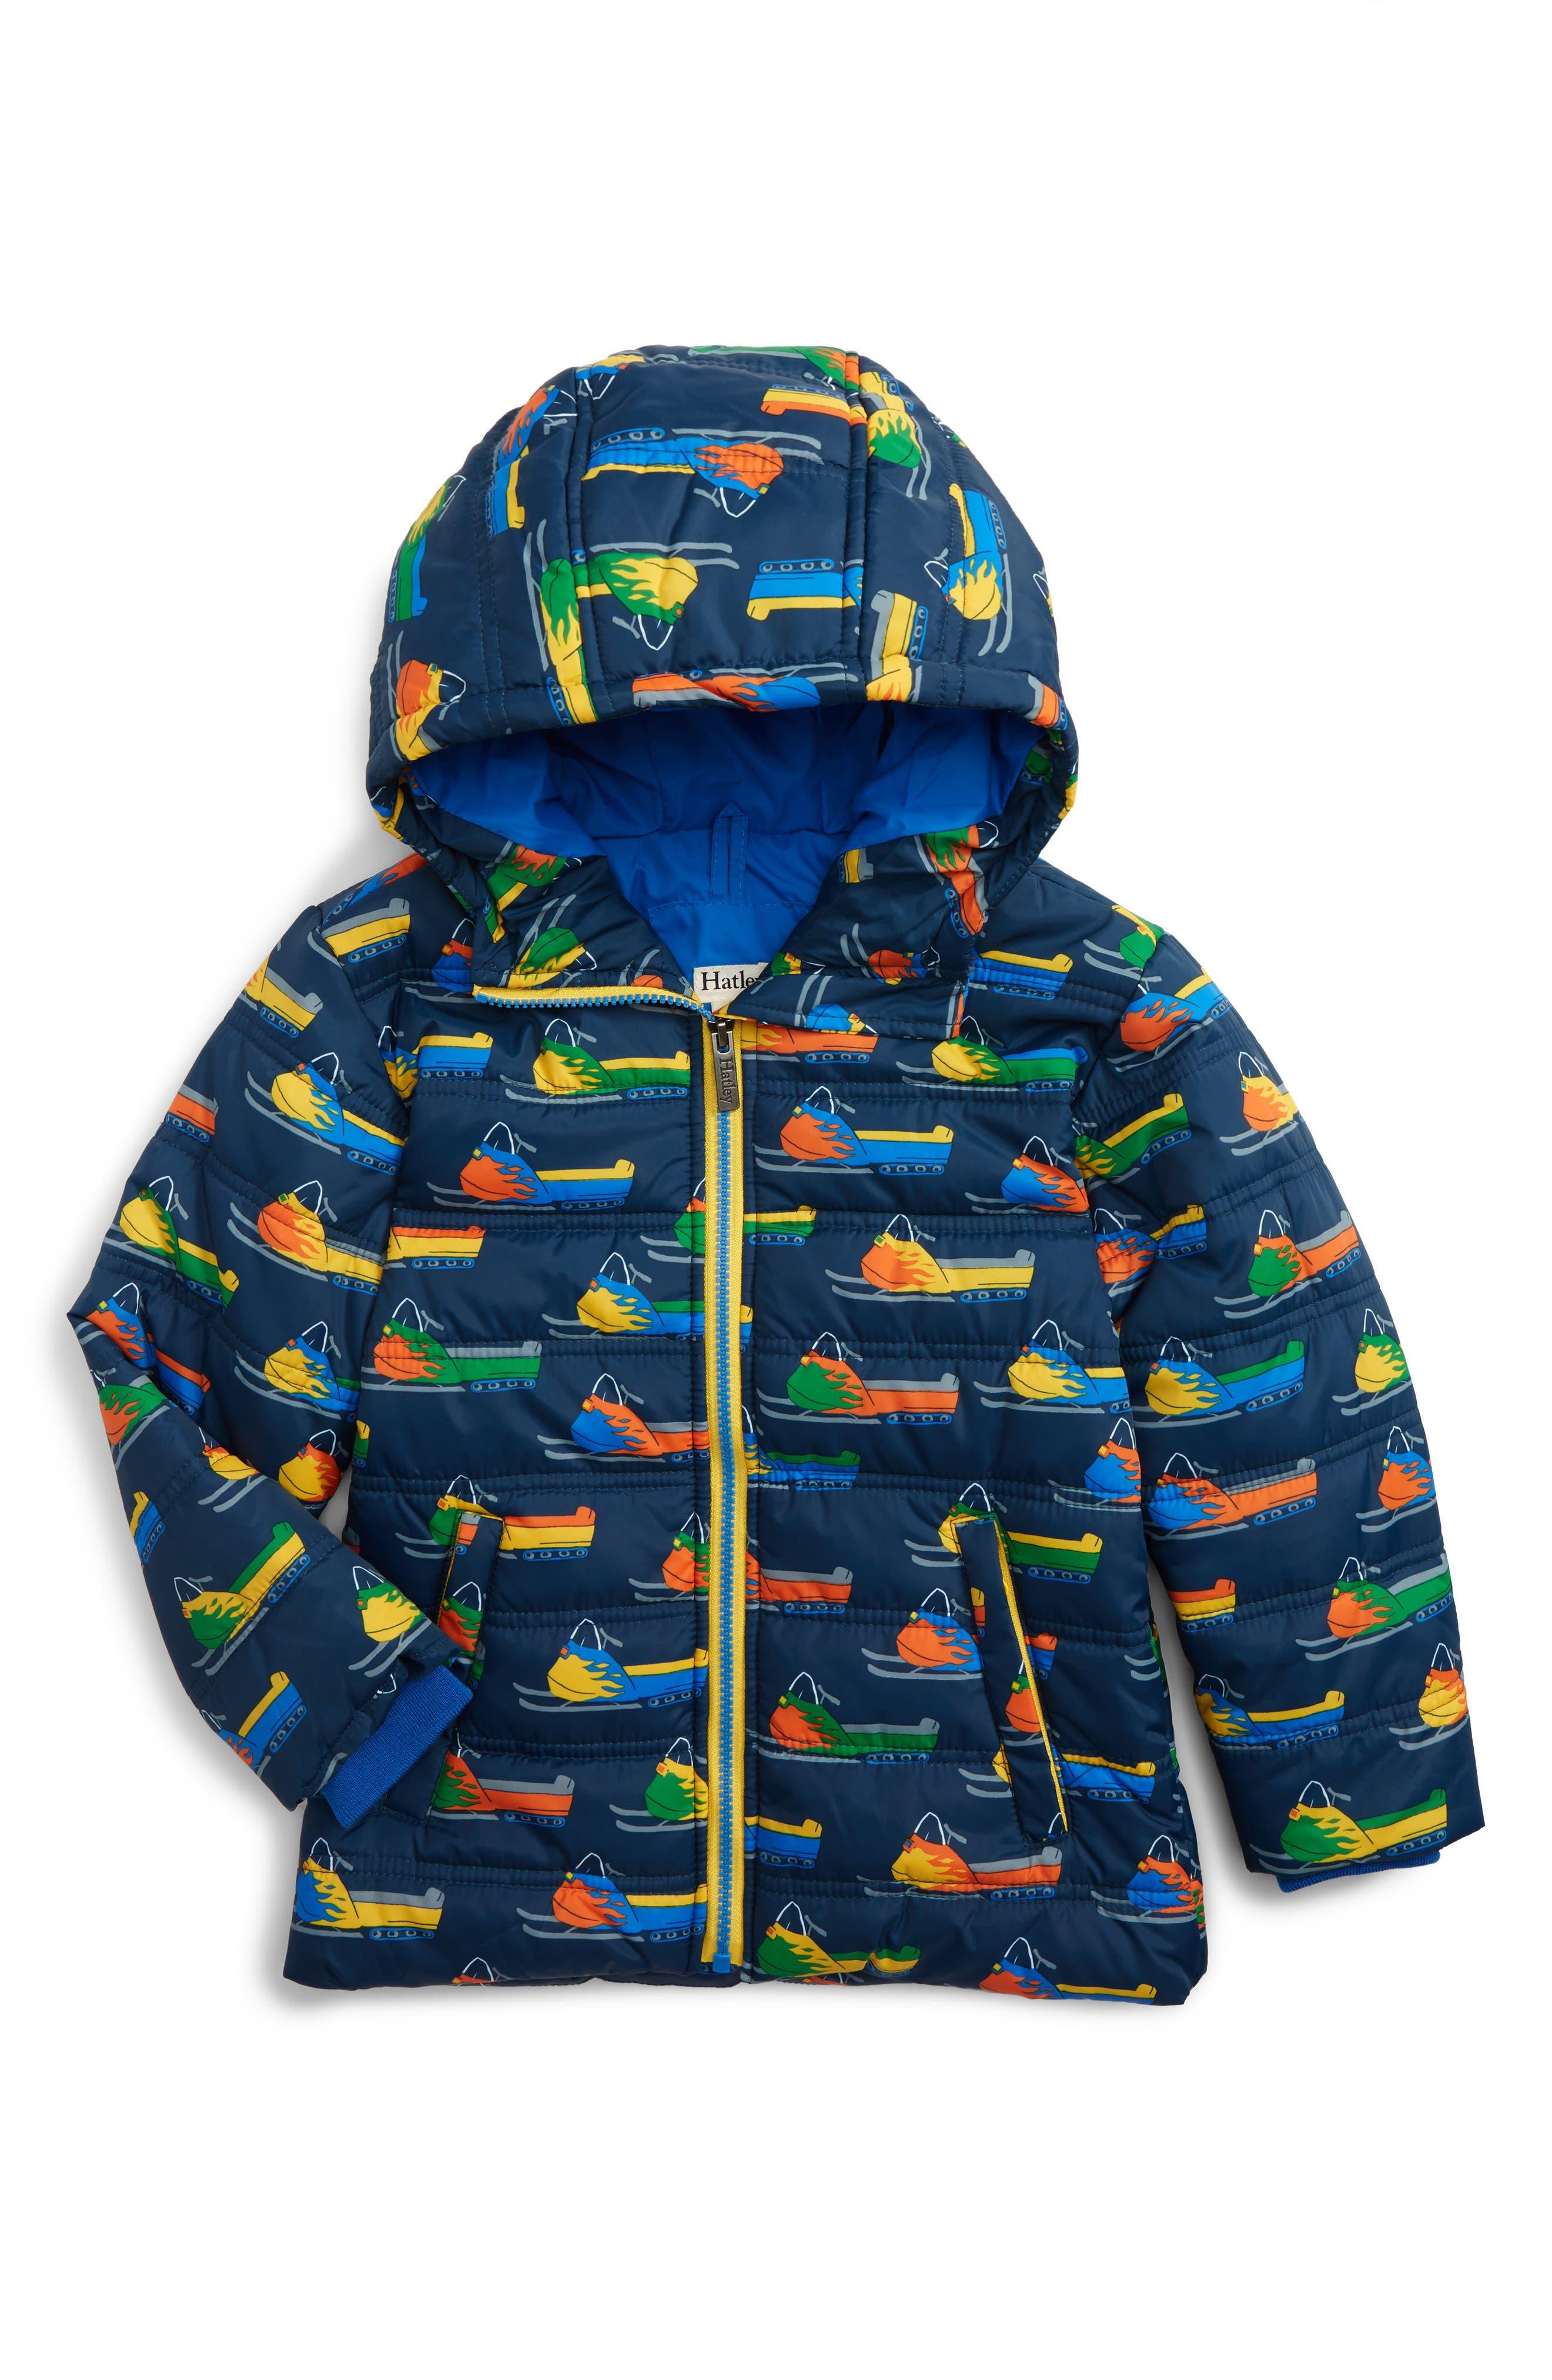 Alternate Image 1 Selected - Hatley Bobsled Print Puffer Jacket (Toddler Boys, Little Boys & Big Boys)